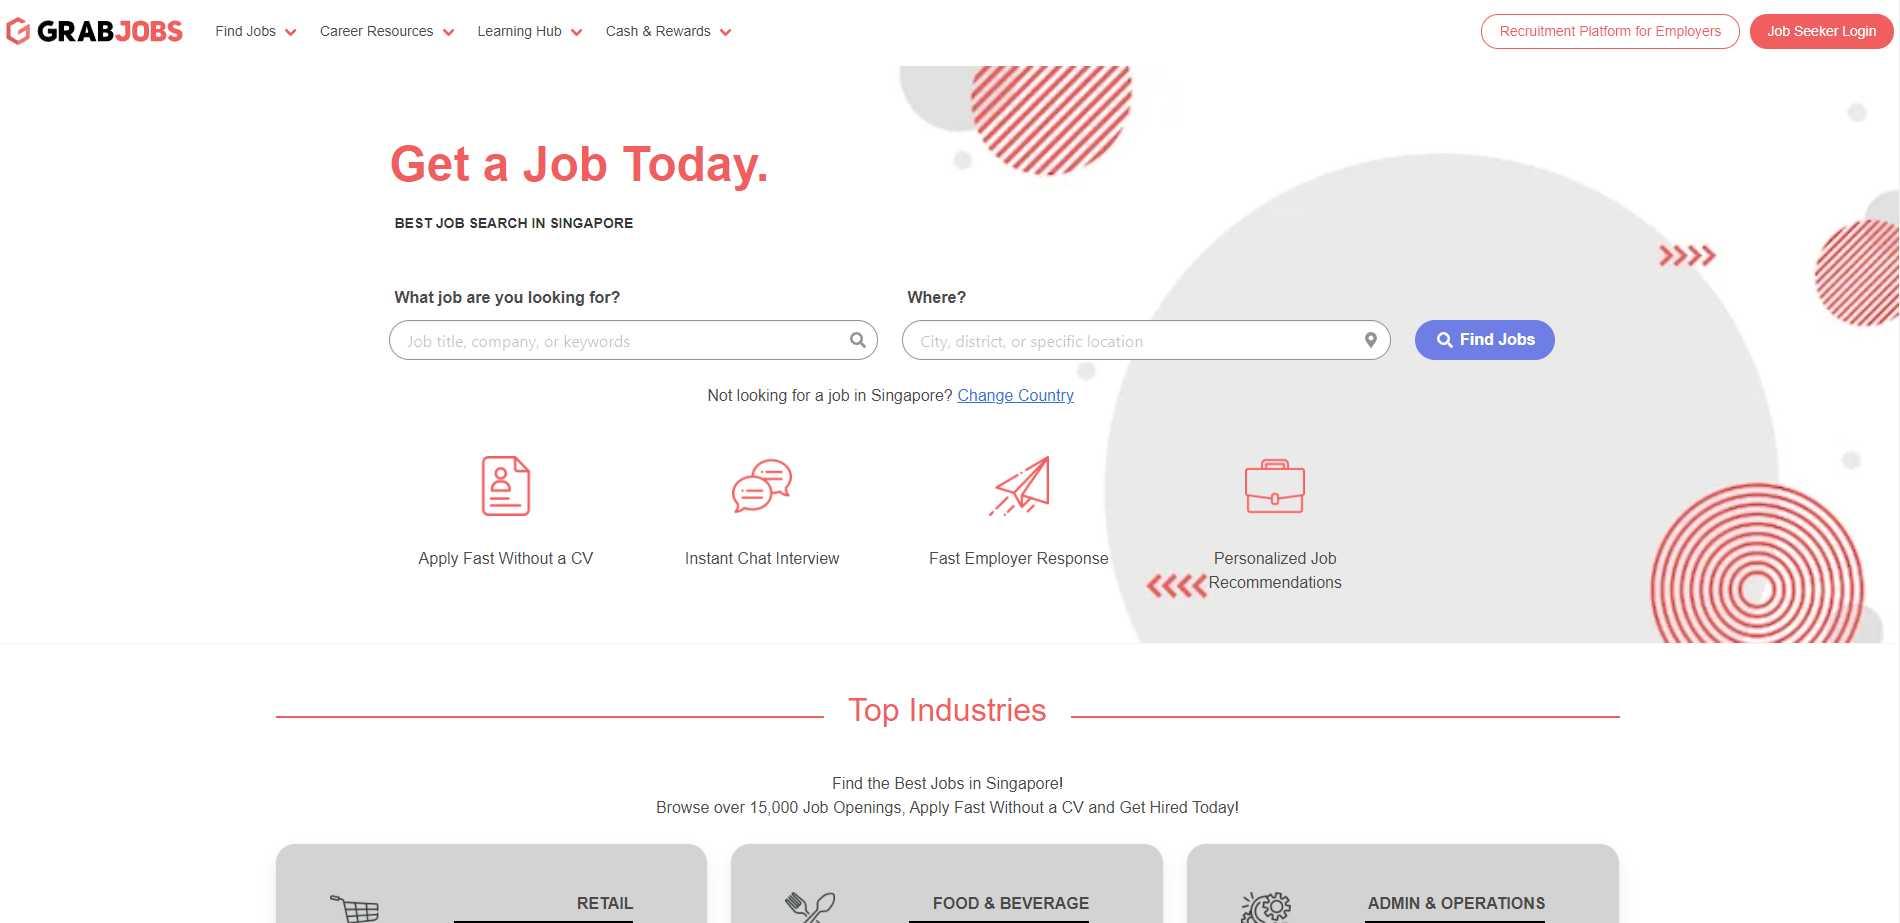 Grab Jobs